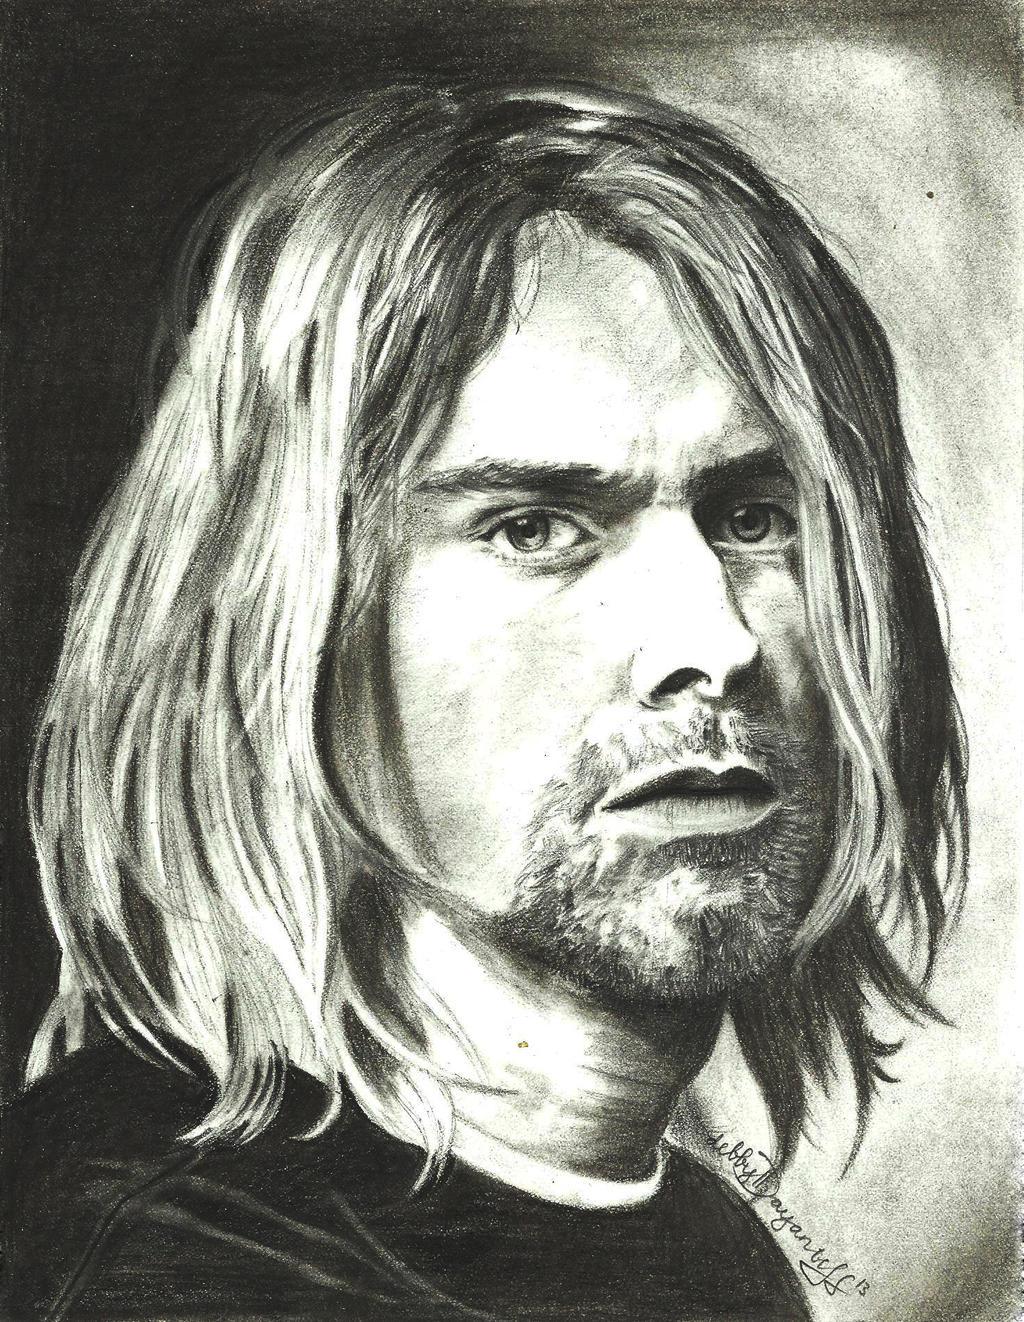 Kurt cobain by debbyjuliansyah777 on deviantart